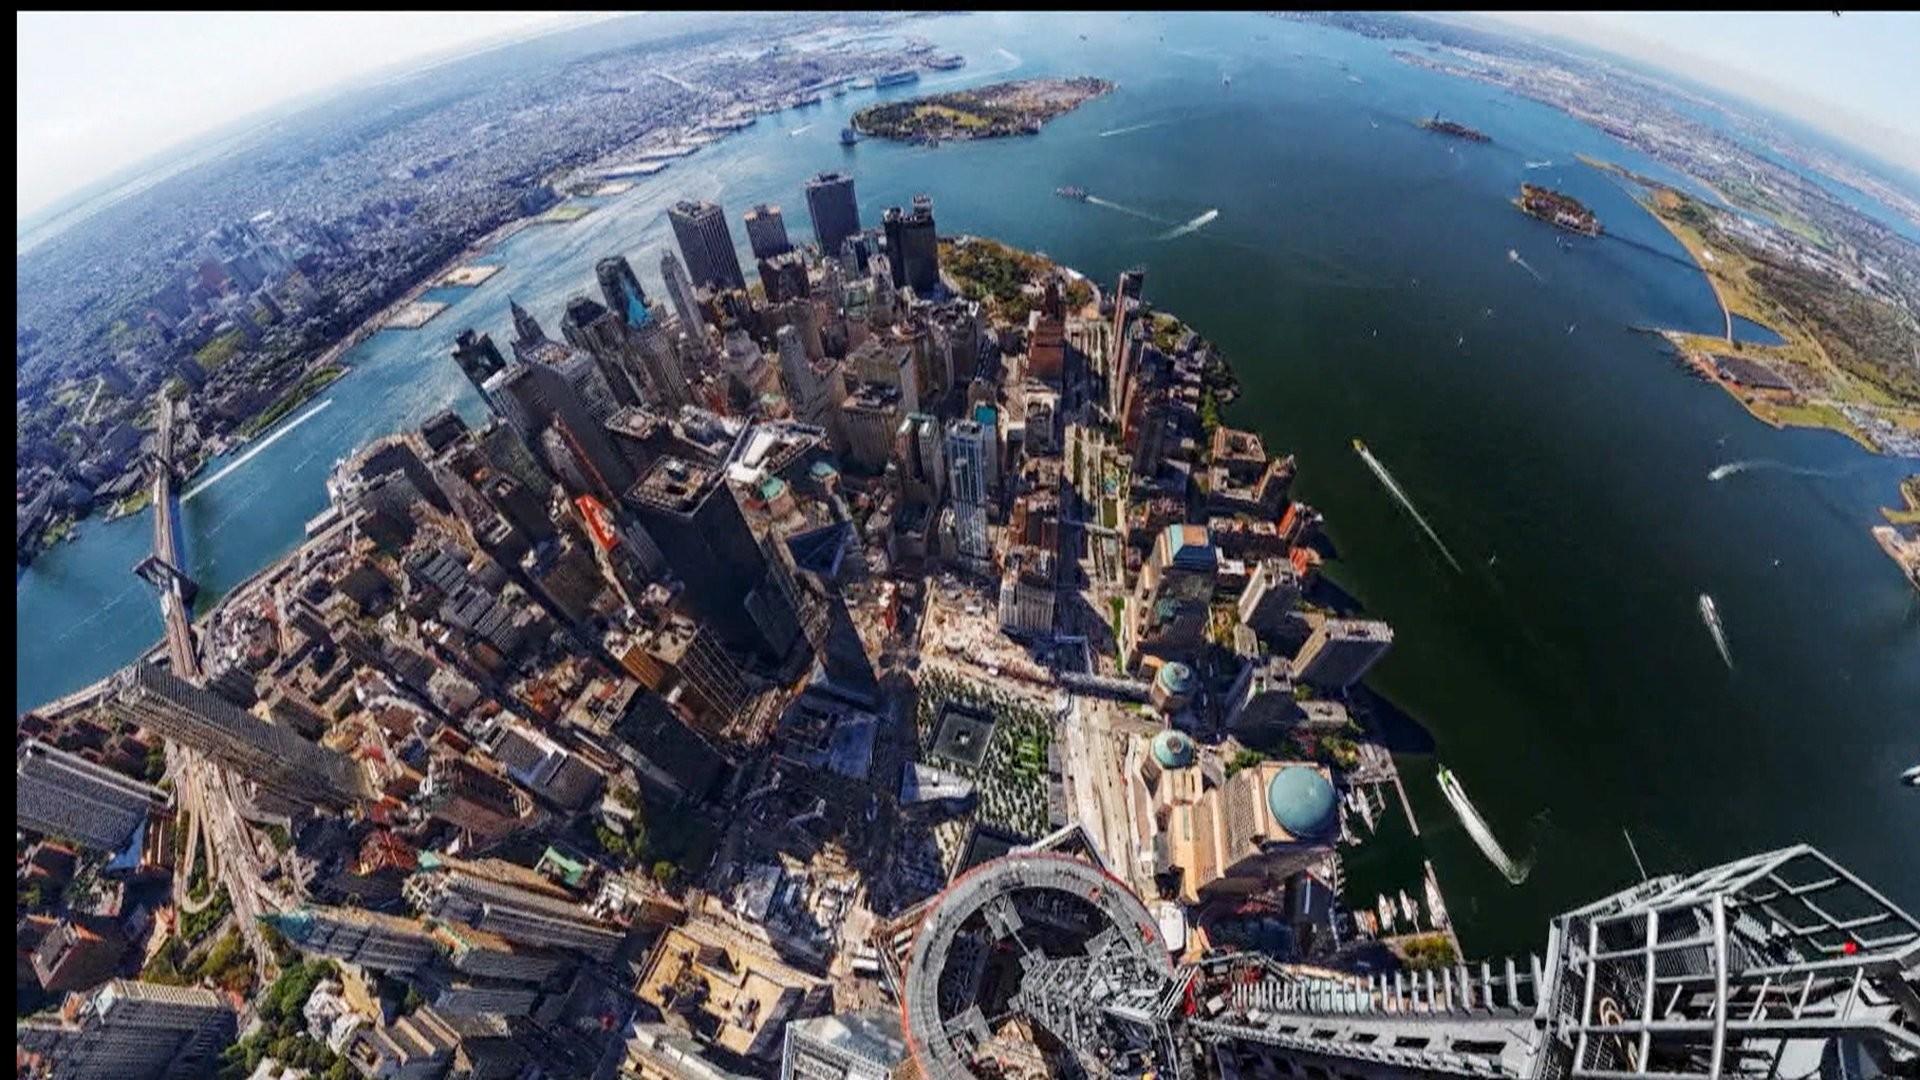 WTC WORLD TRADE CENTER skyscraper city cities building new york wallpaper |  | 419988 | WallpaperUP